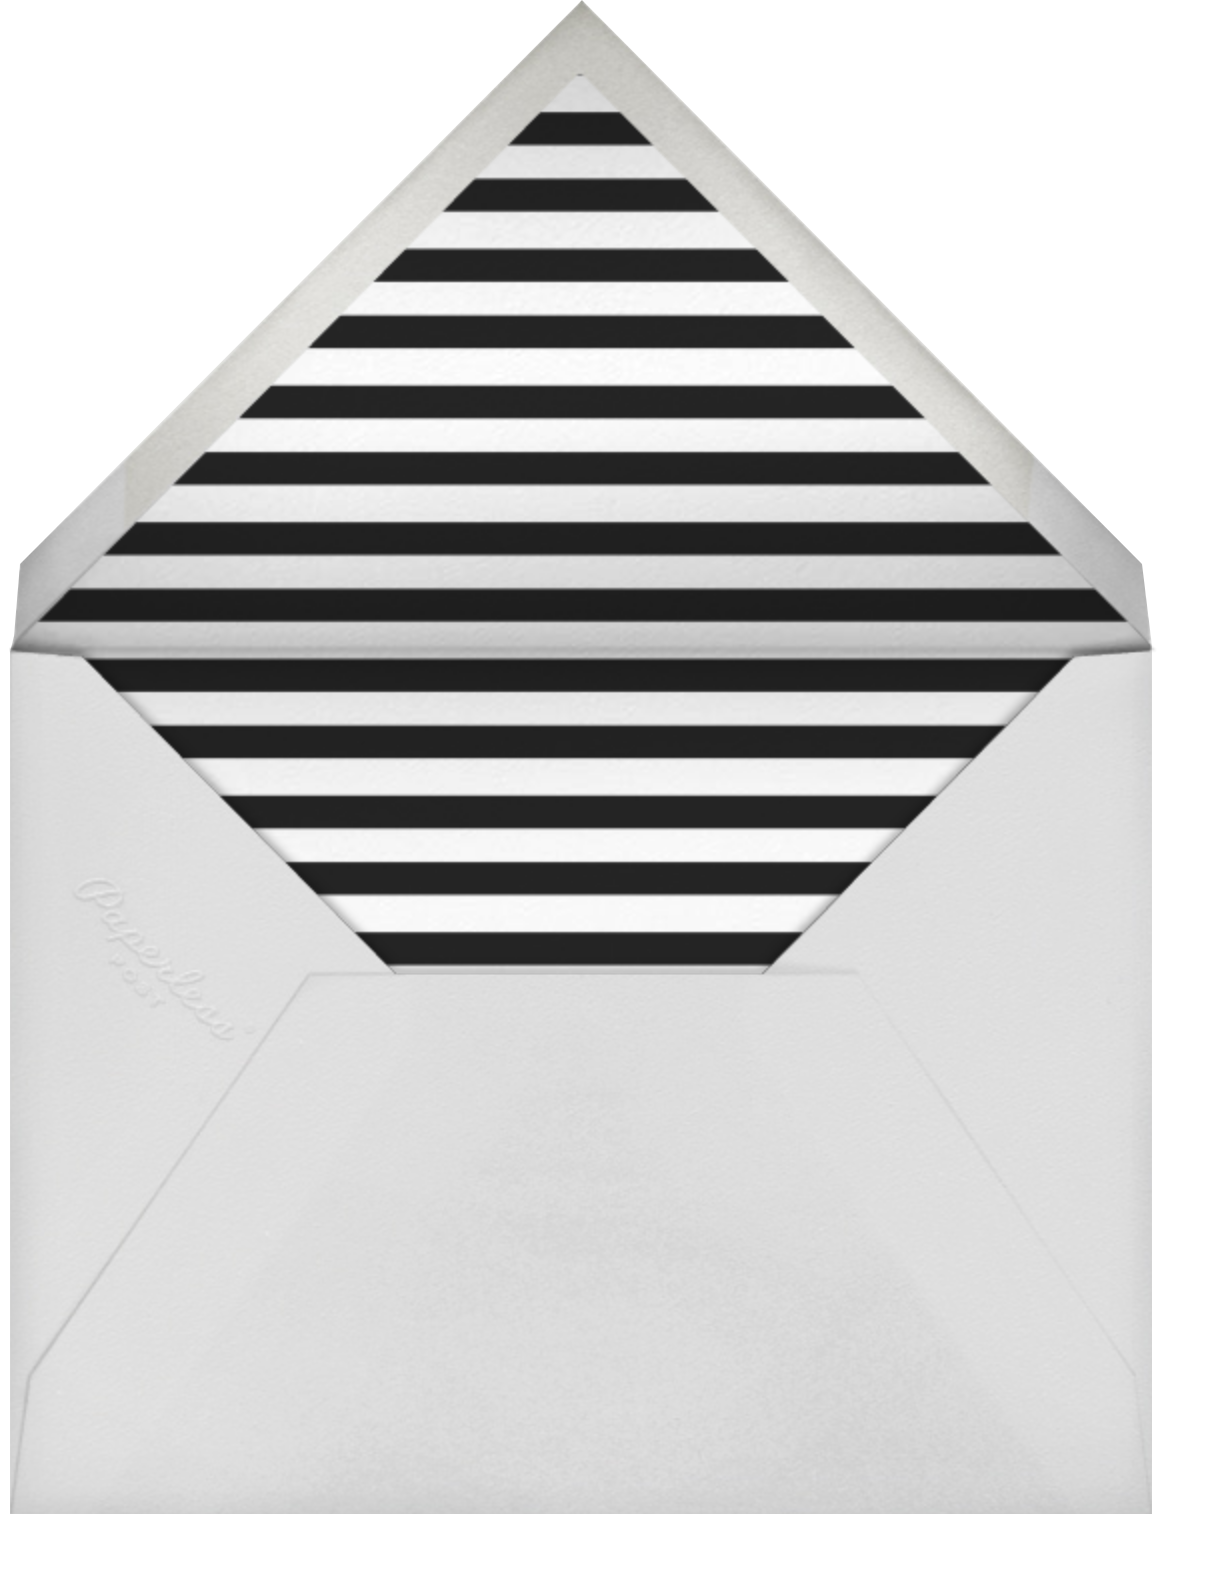 Confetti Horizontal (Single-Sided Photo) - Rose Gold - kate spade new york - Adult birthday - envelope back